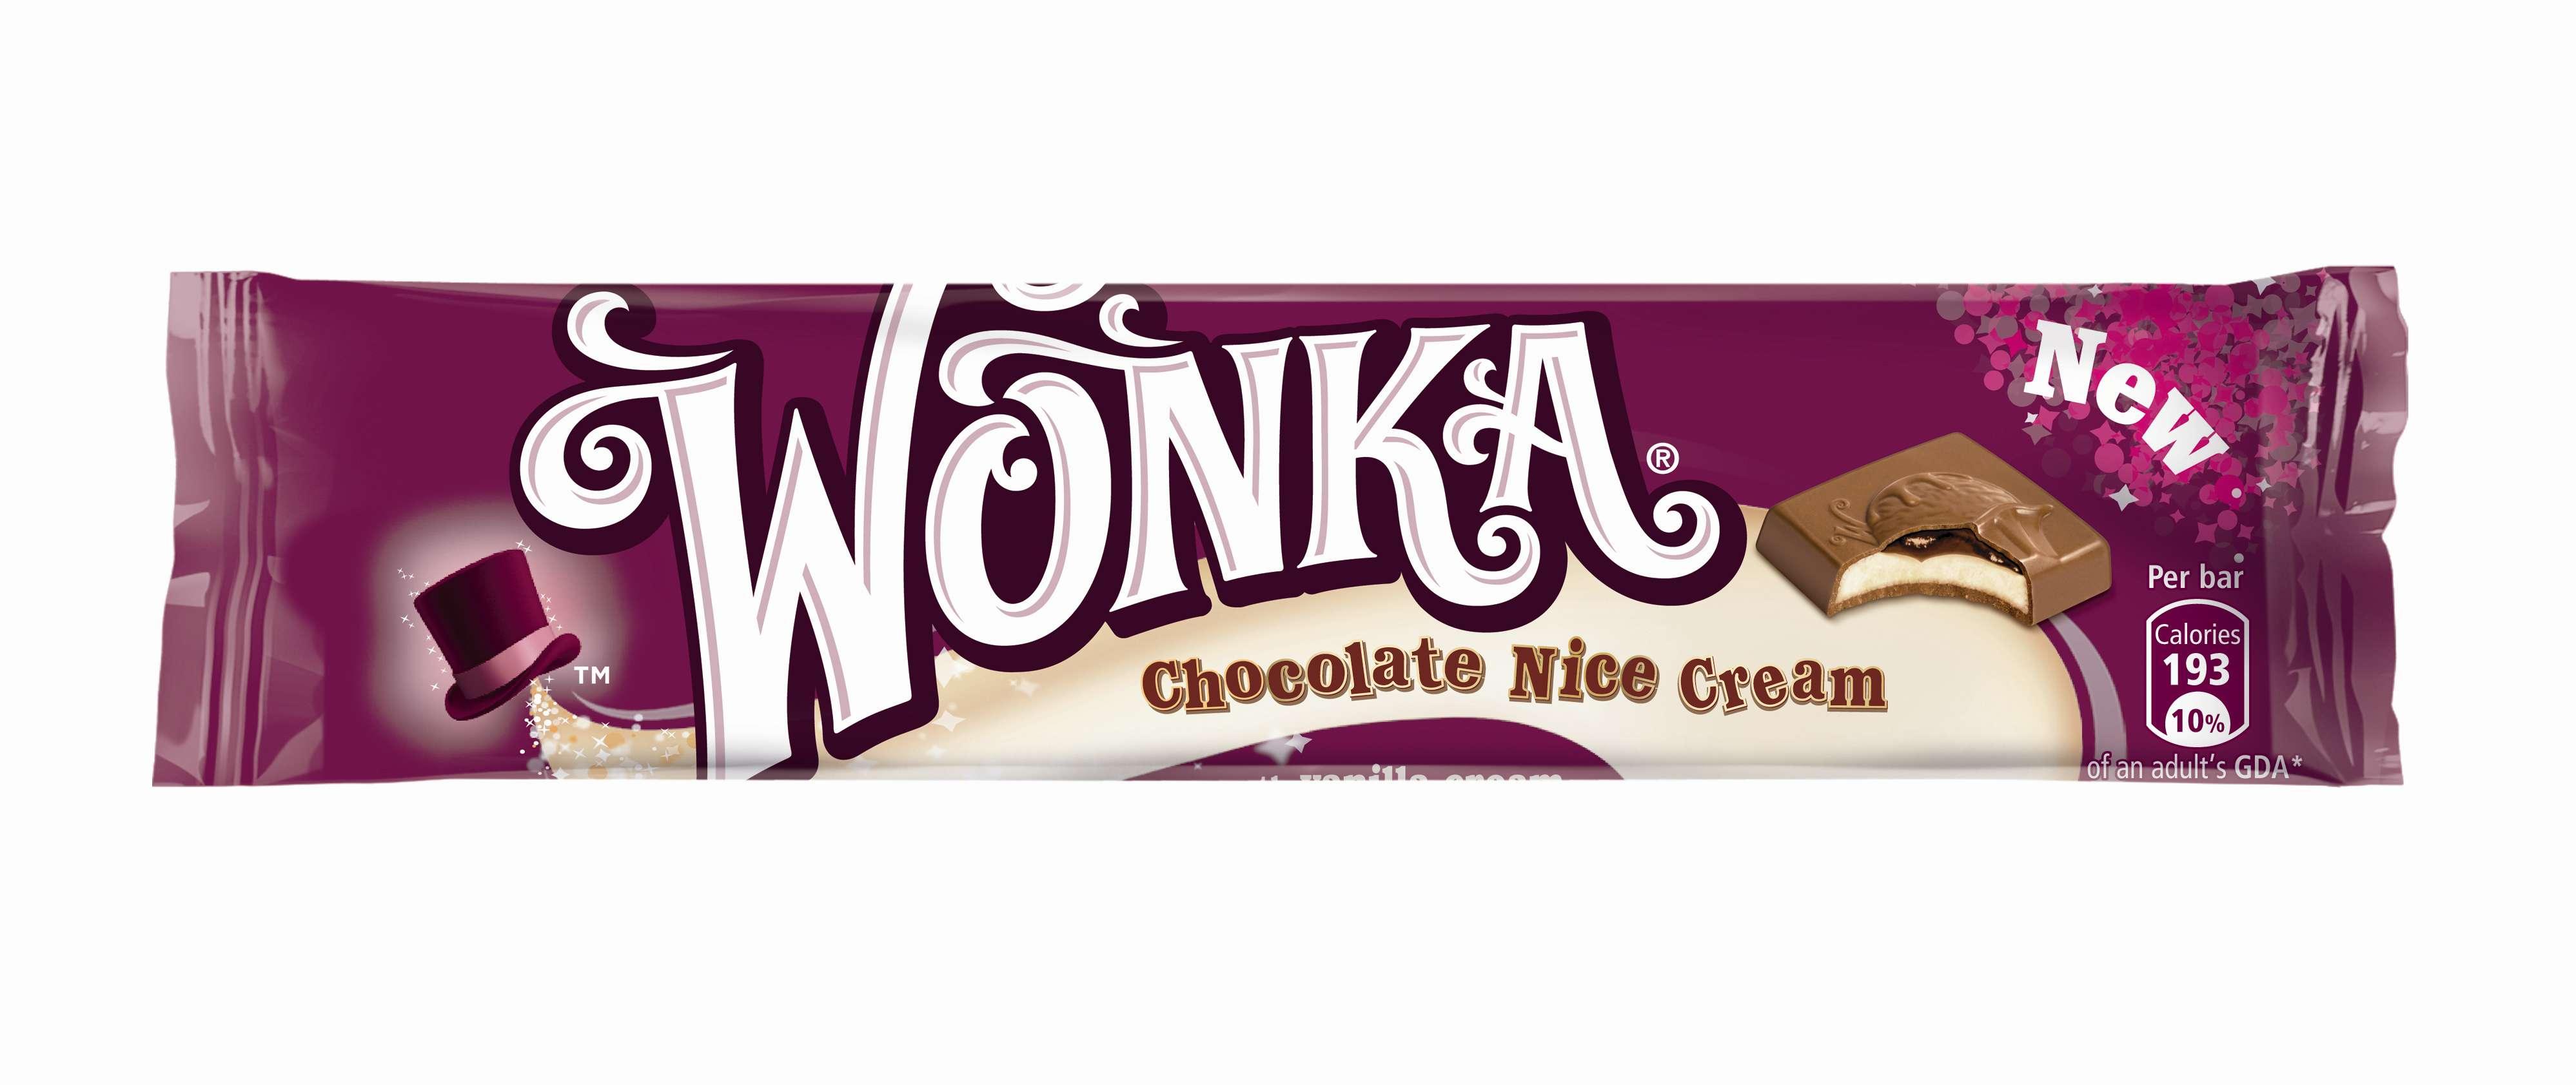 chocolates brands - photo #27